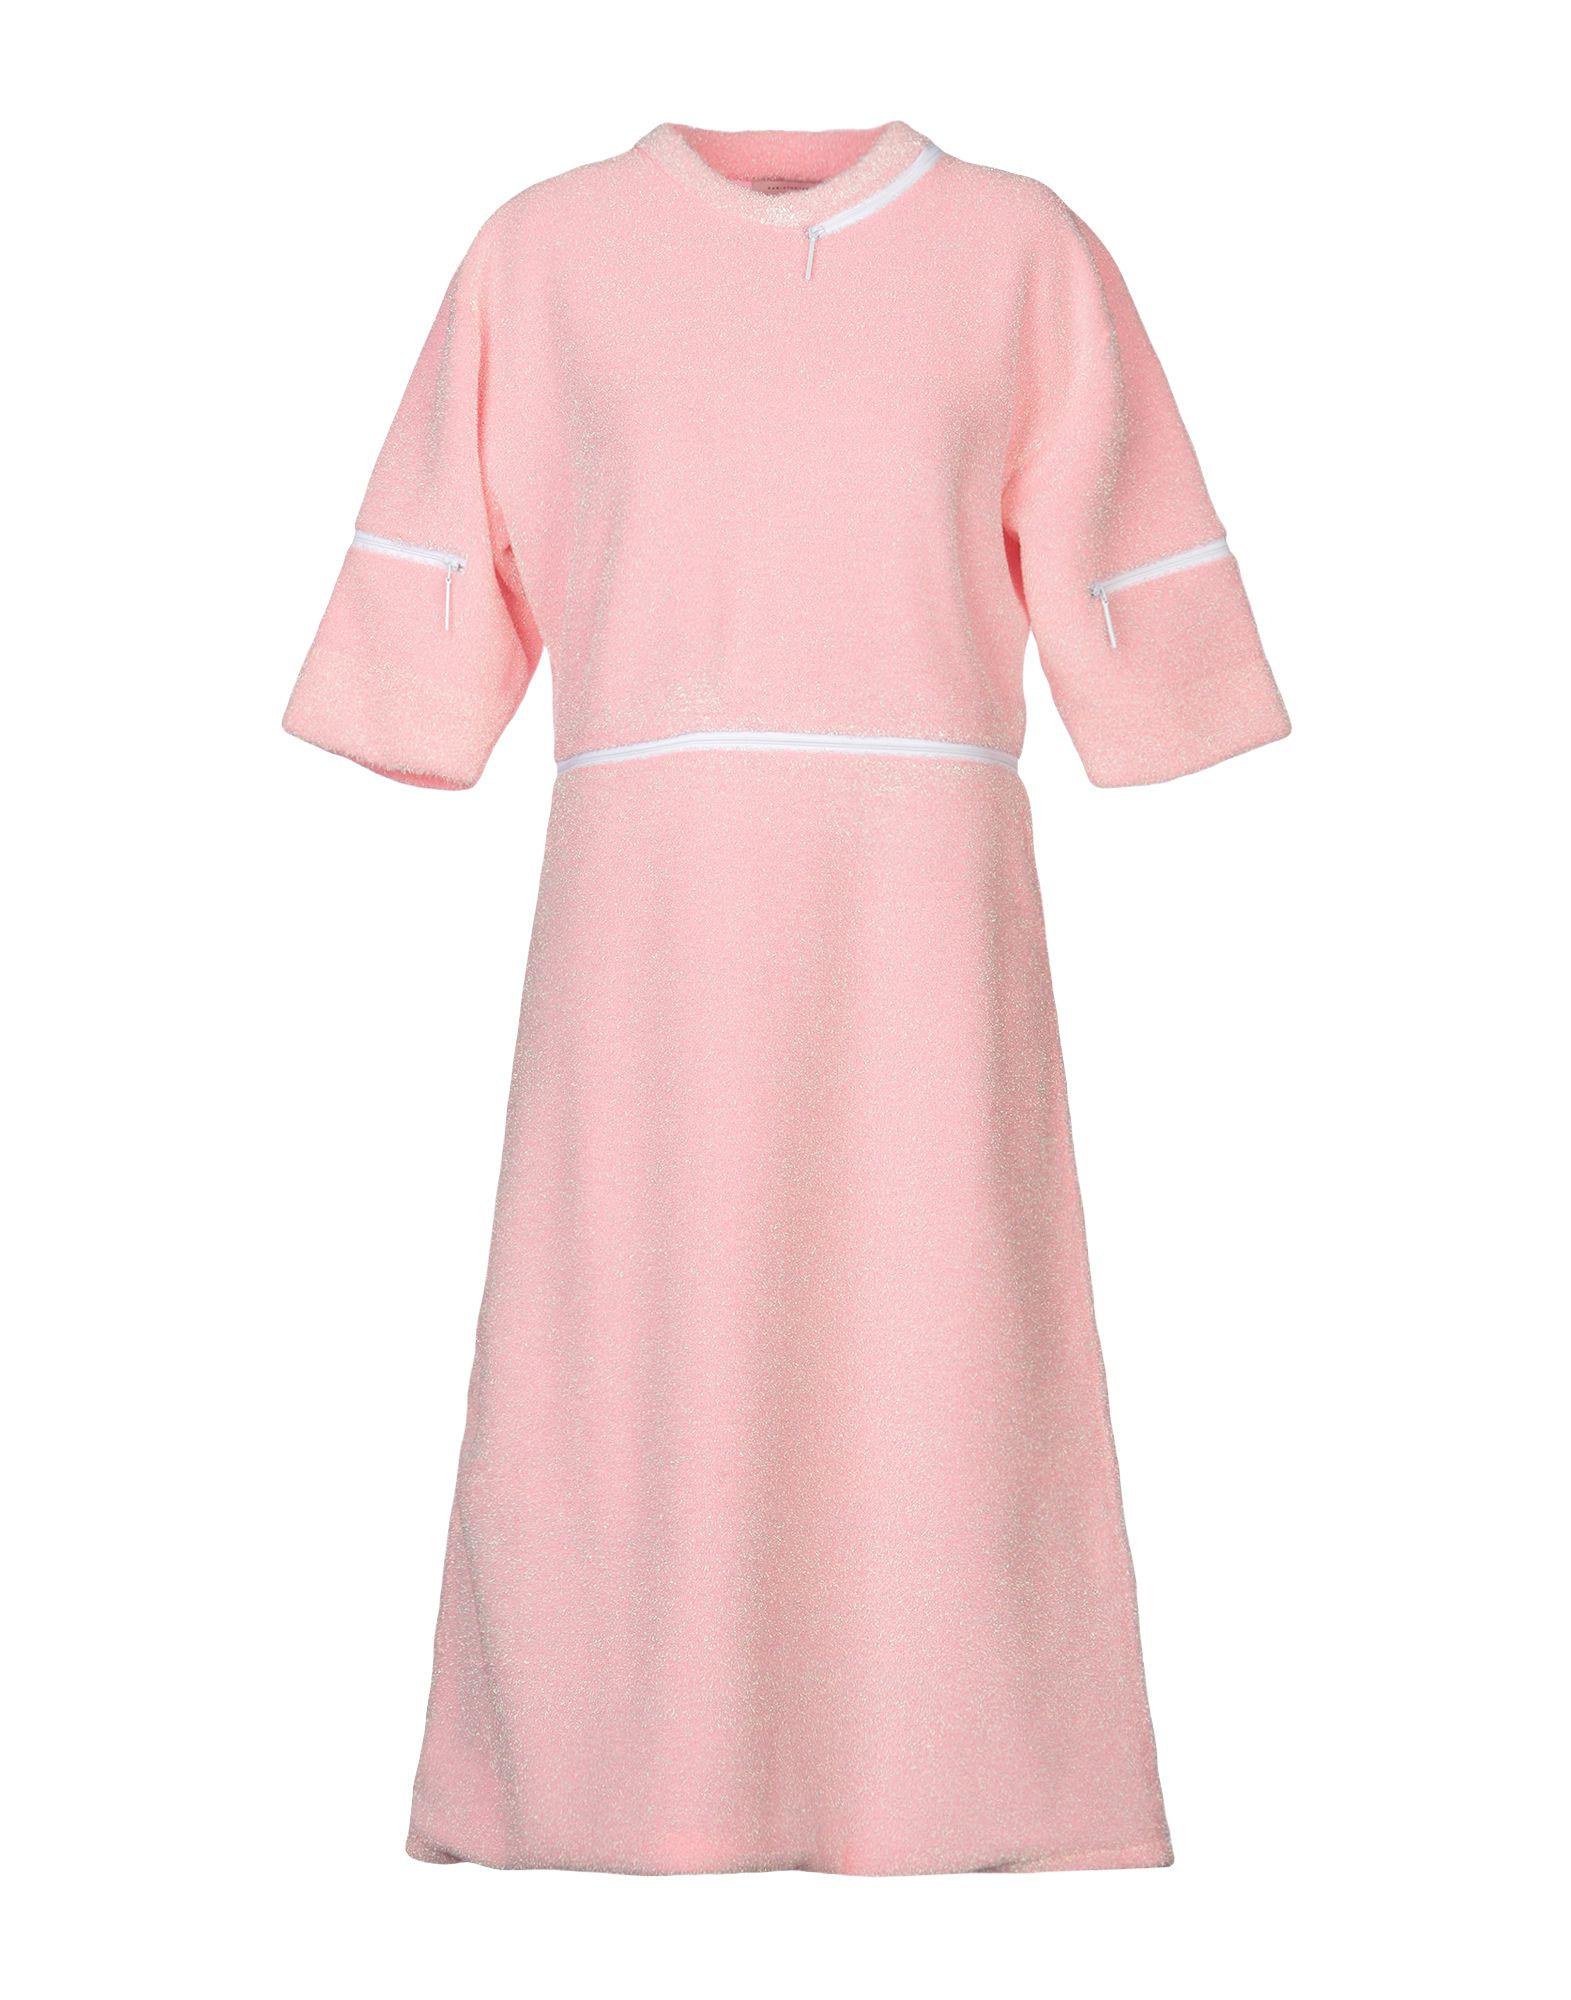 CHRISTOPHER KANE Платье длиной 3/4